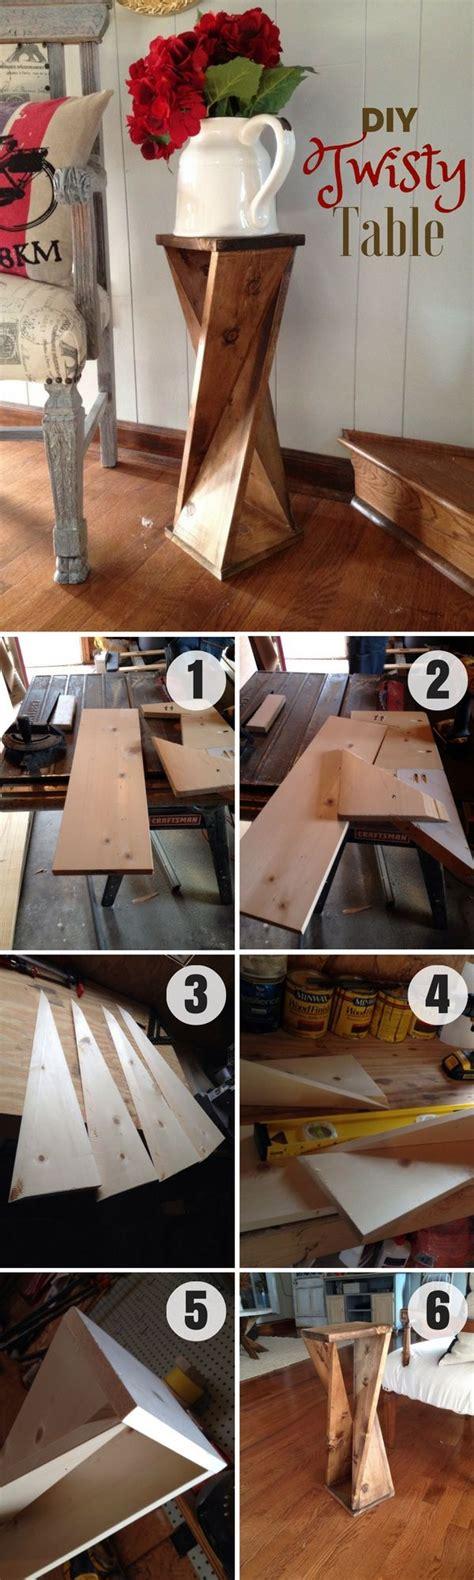 craft work for home decoration best 25 wood crafts ideas on pinterest diy wood crafts